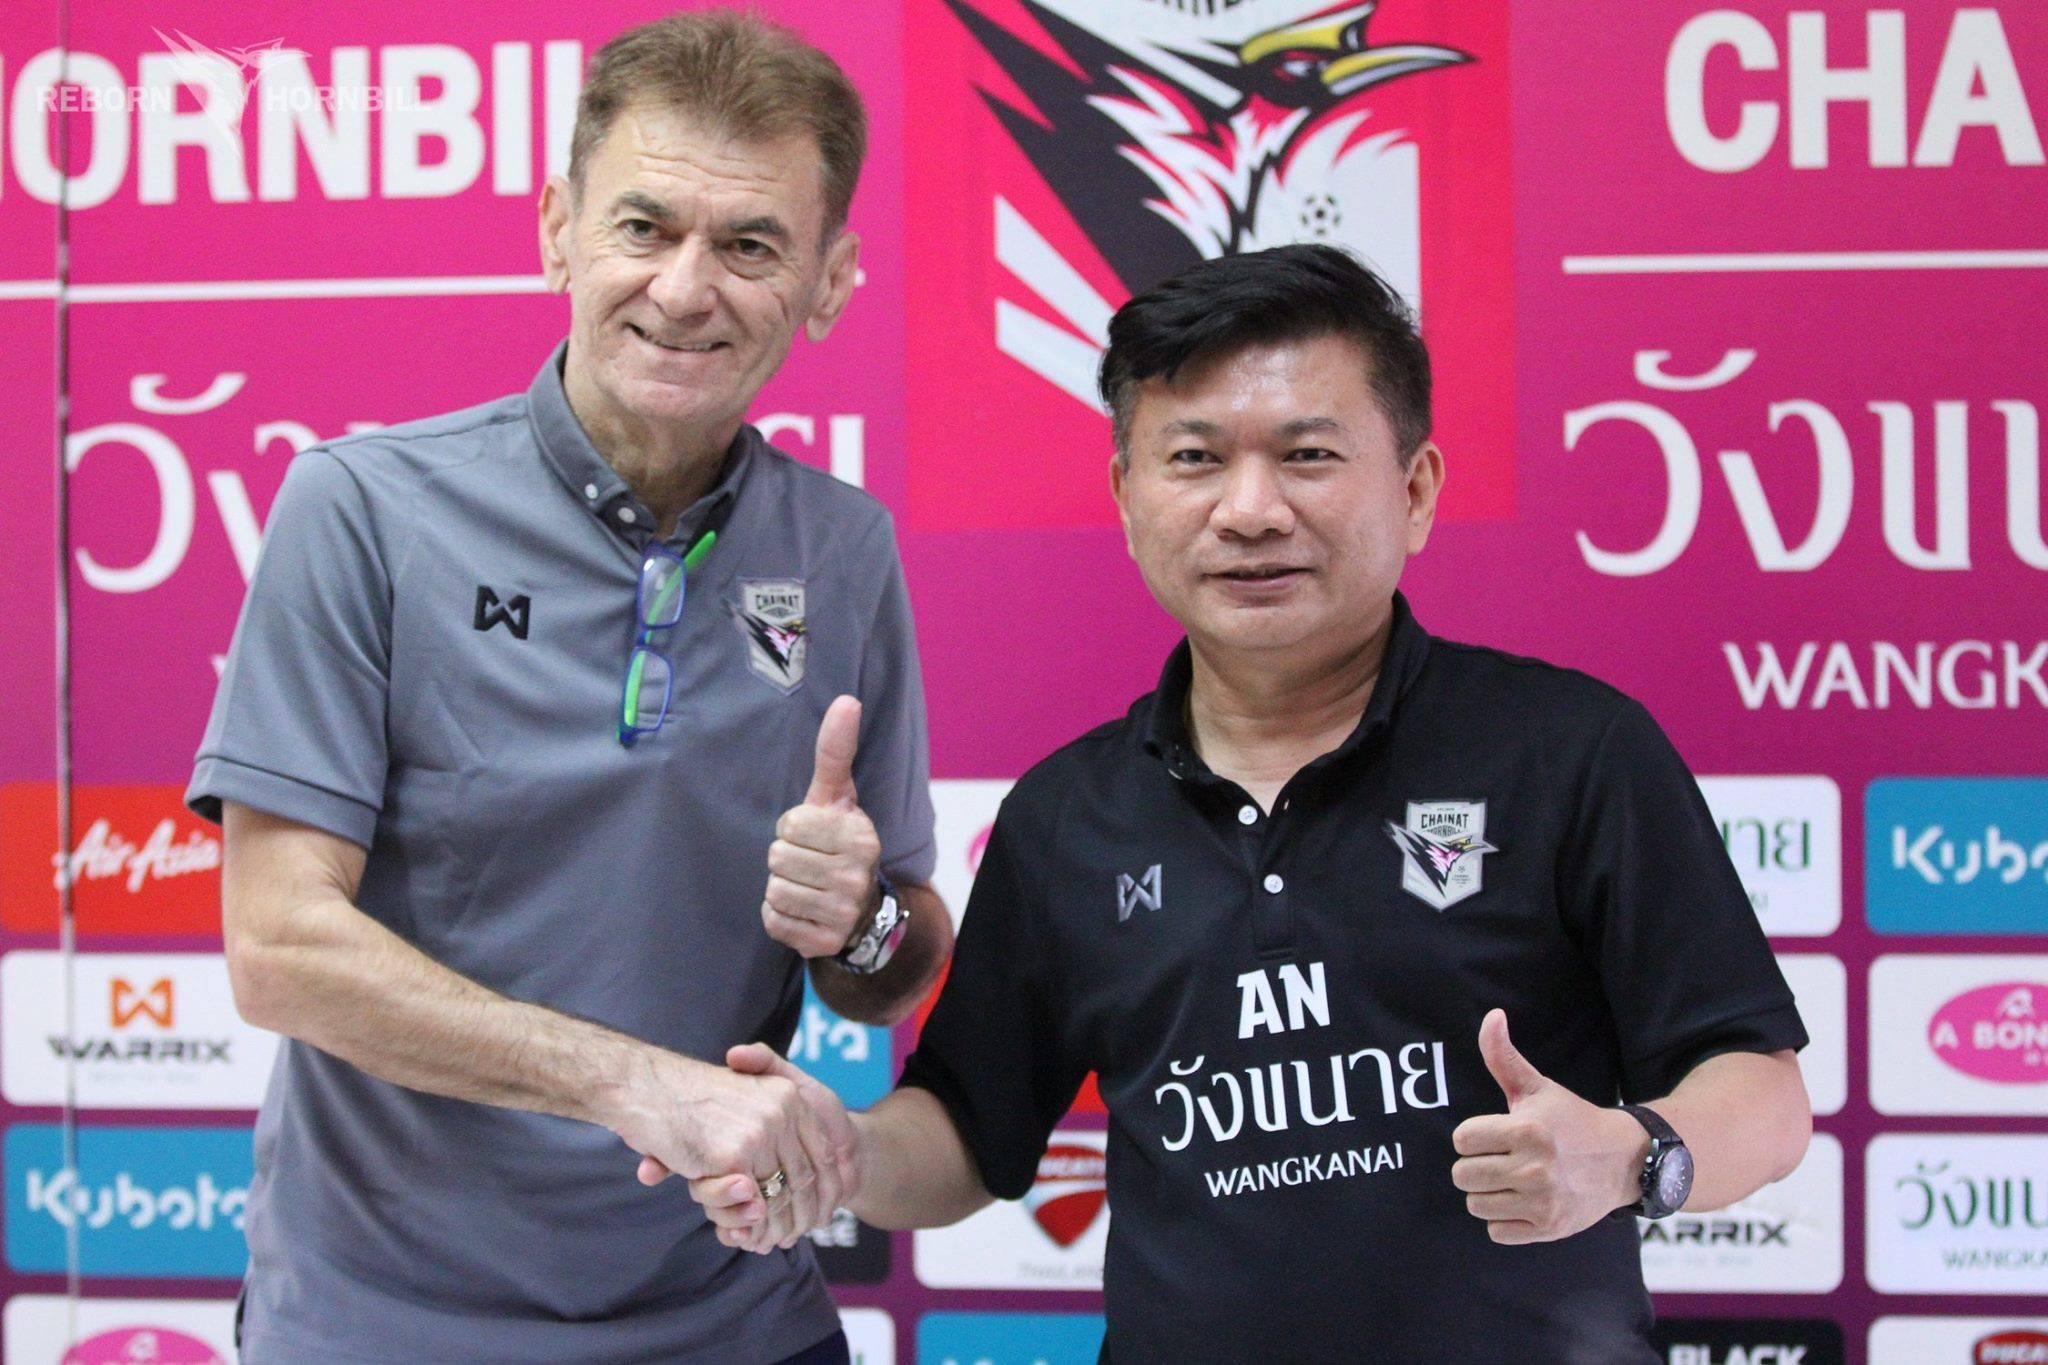 Chainat Hornbill appoint former Persib Bandung boss Drago Mamic as head coach